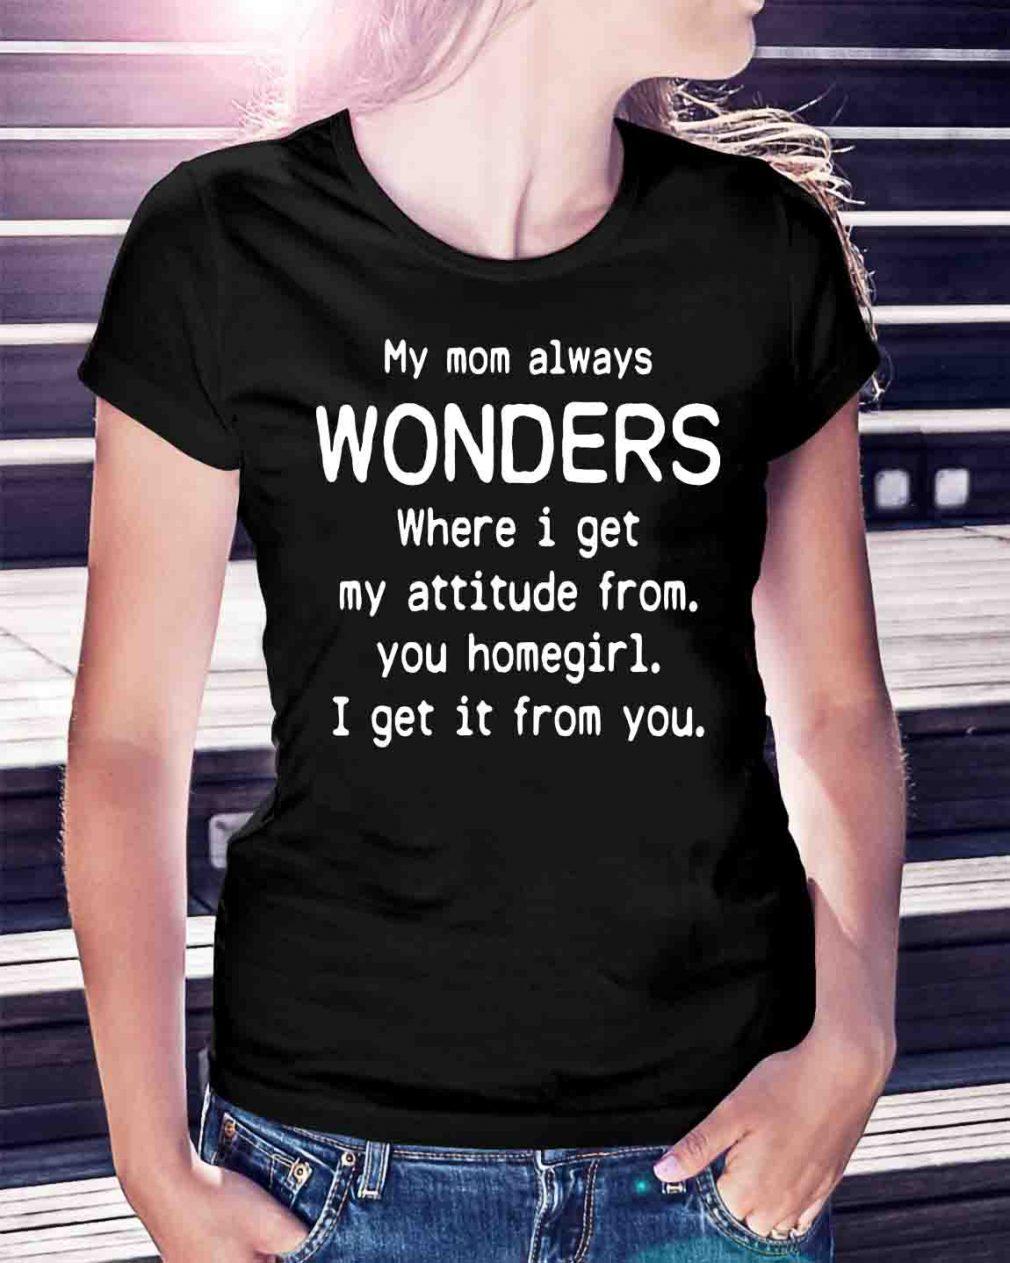 My mom always wonders where I get my attitude from you homegirl shirt